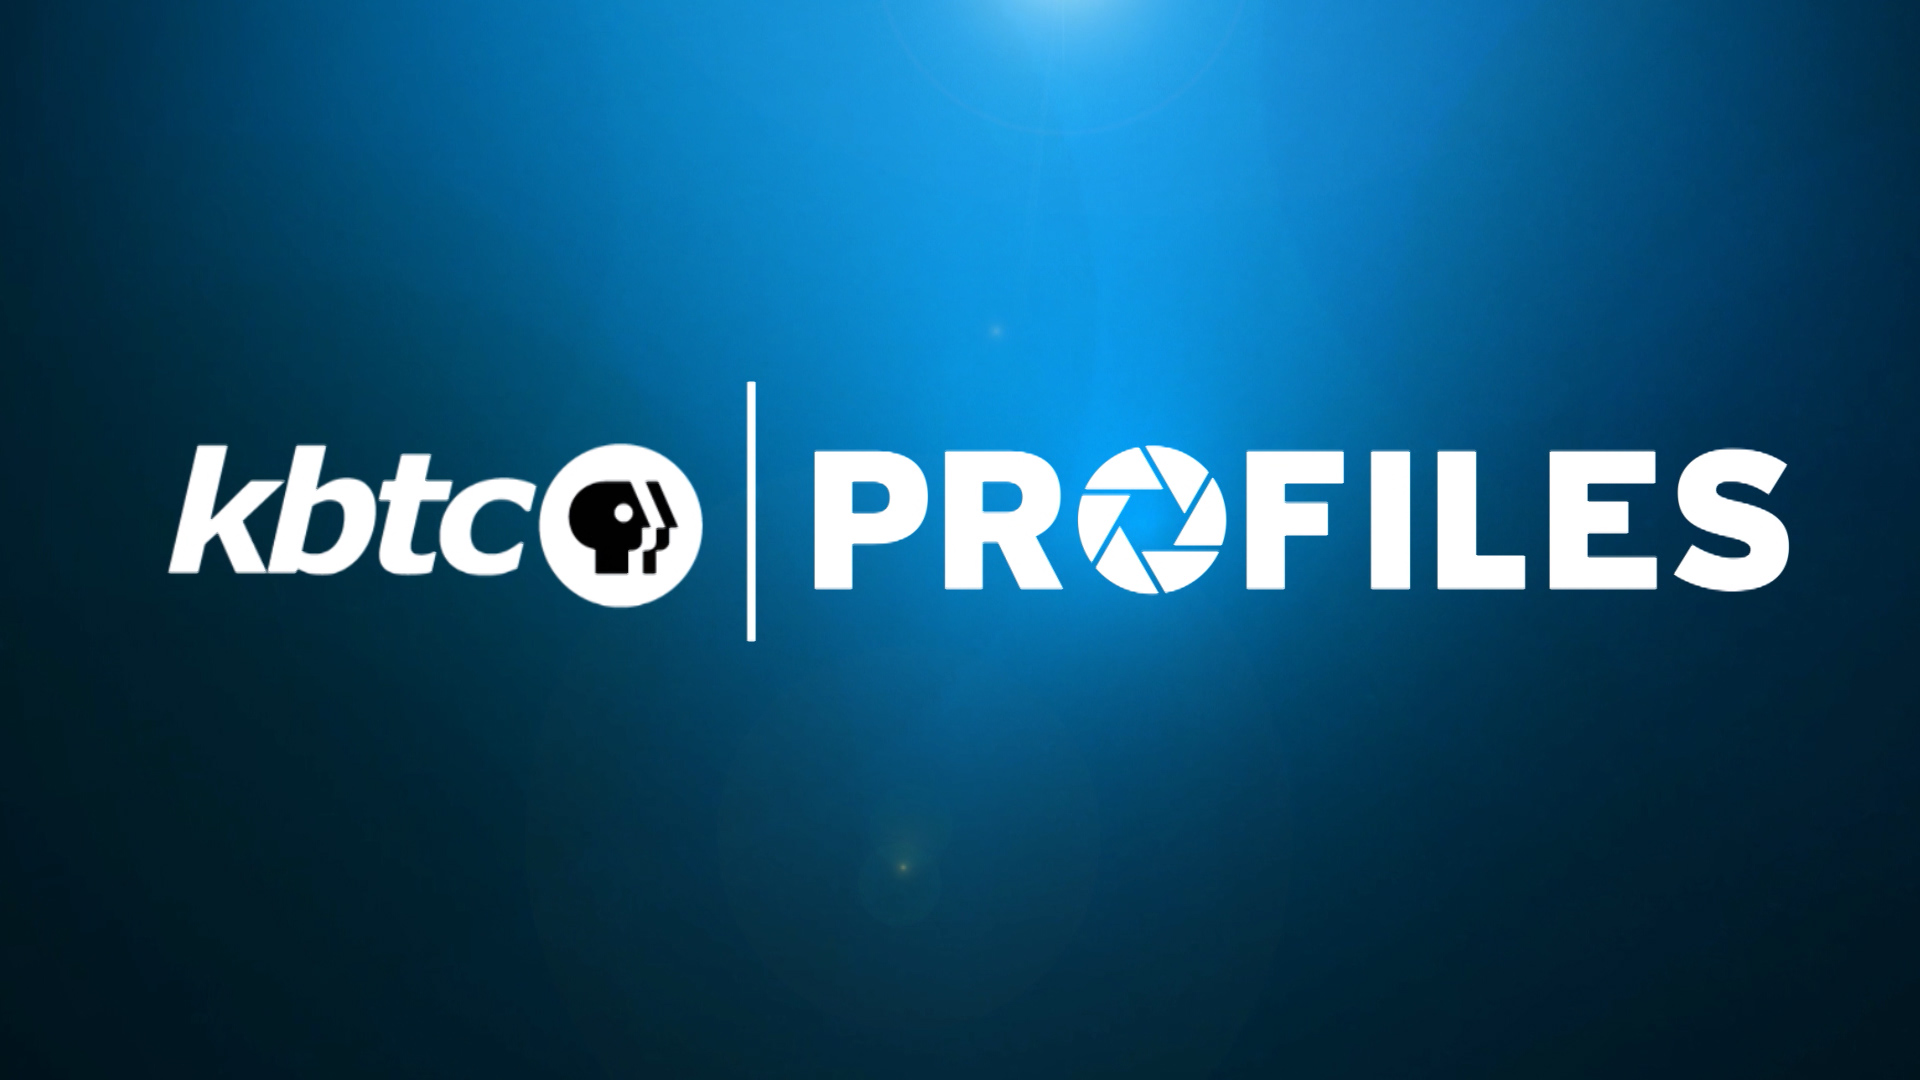 KBTC Profiles